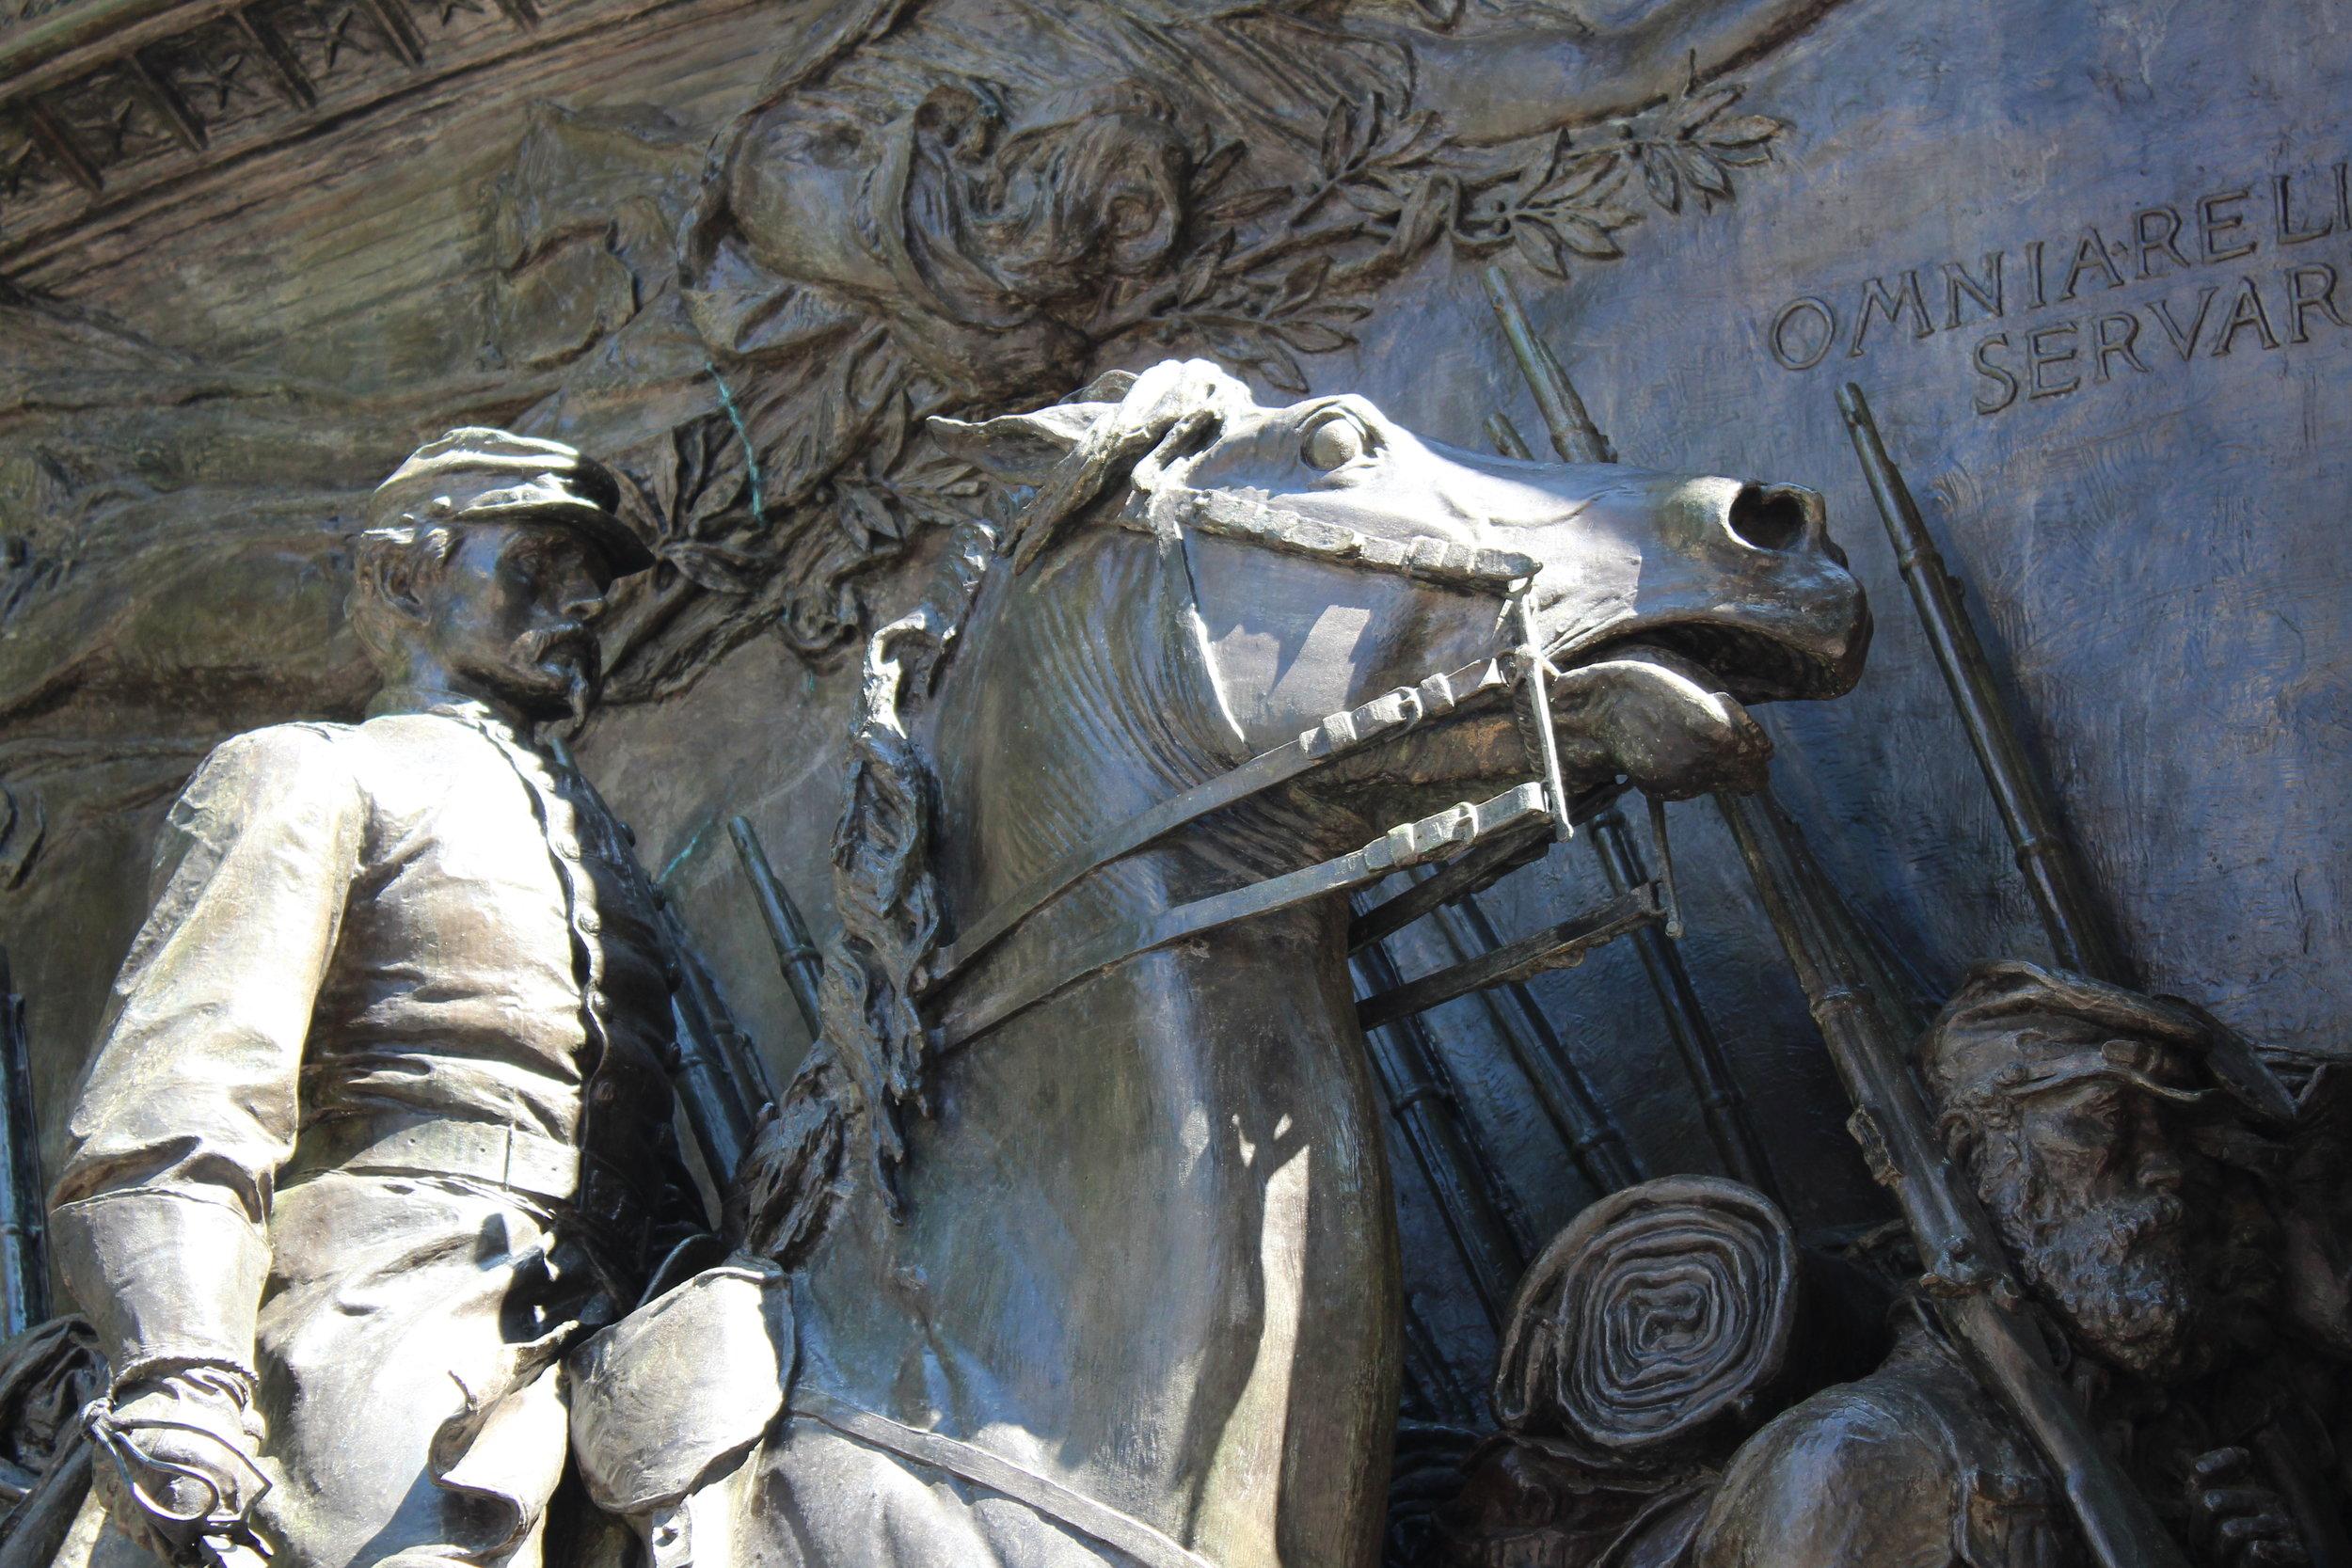 Detail of Augustus Saint-Gardens' work